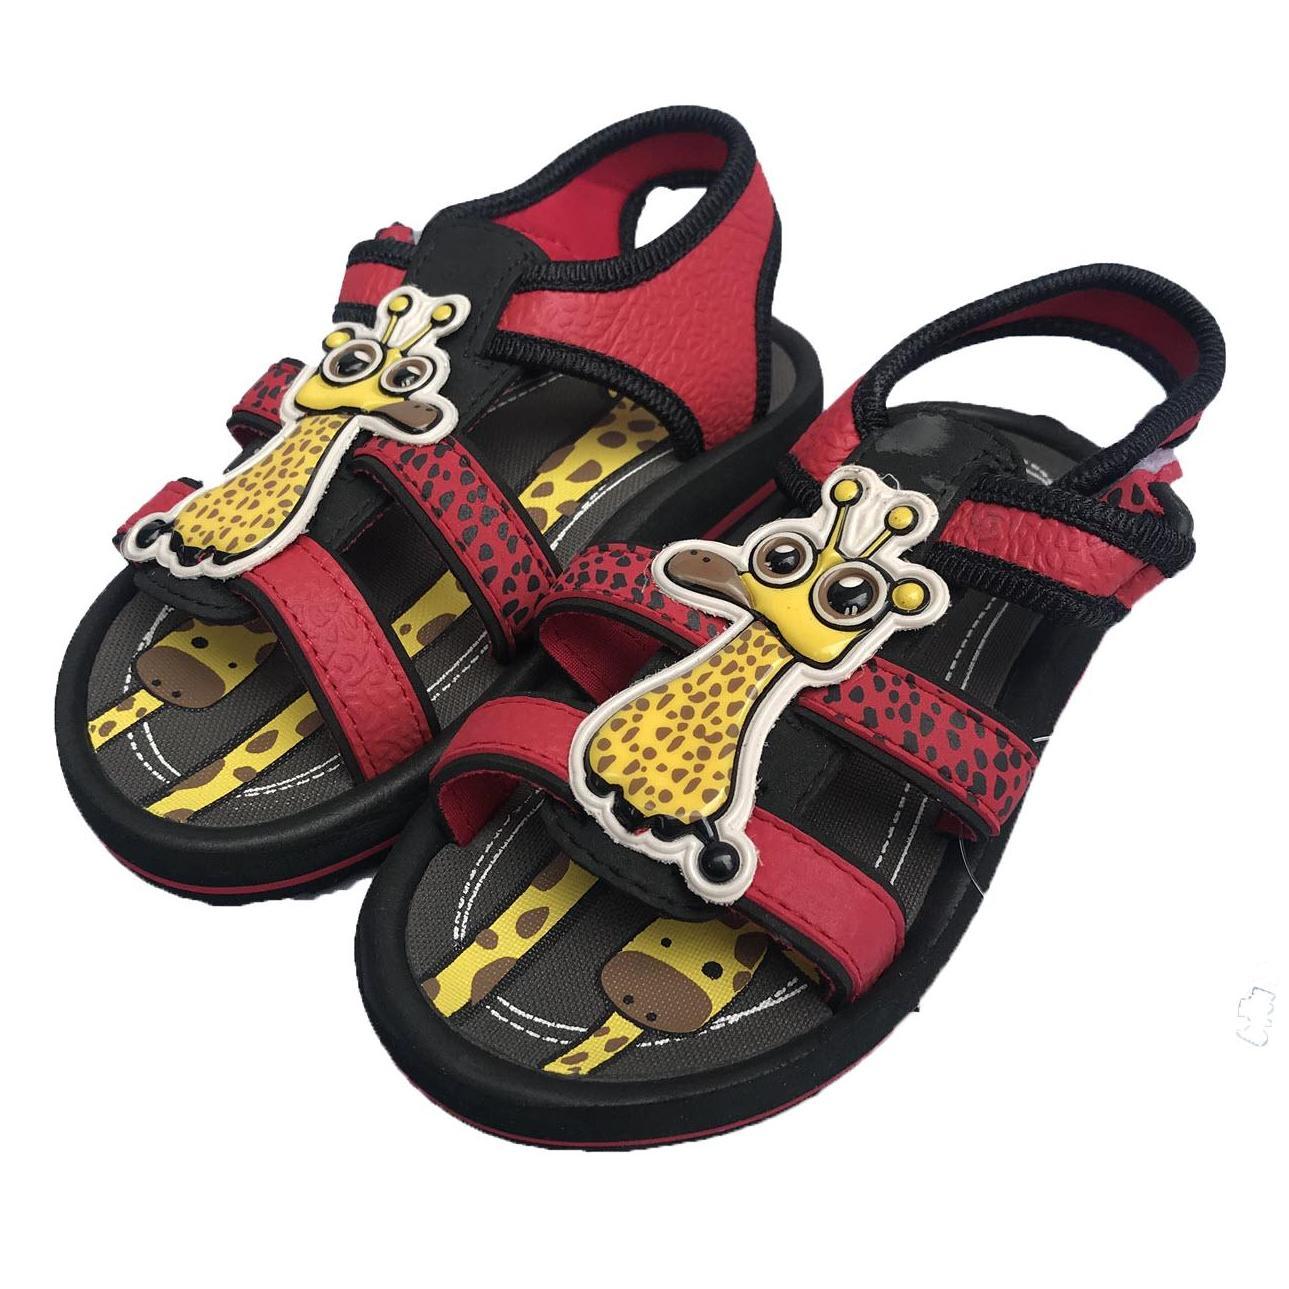 Giày Sandal bé Trai Biti's SXB009255DEN